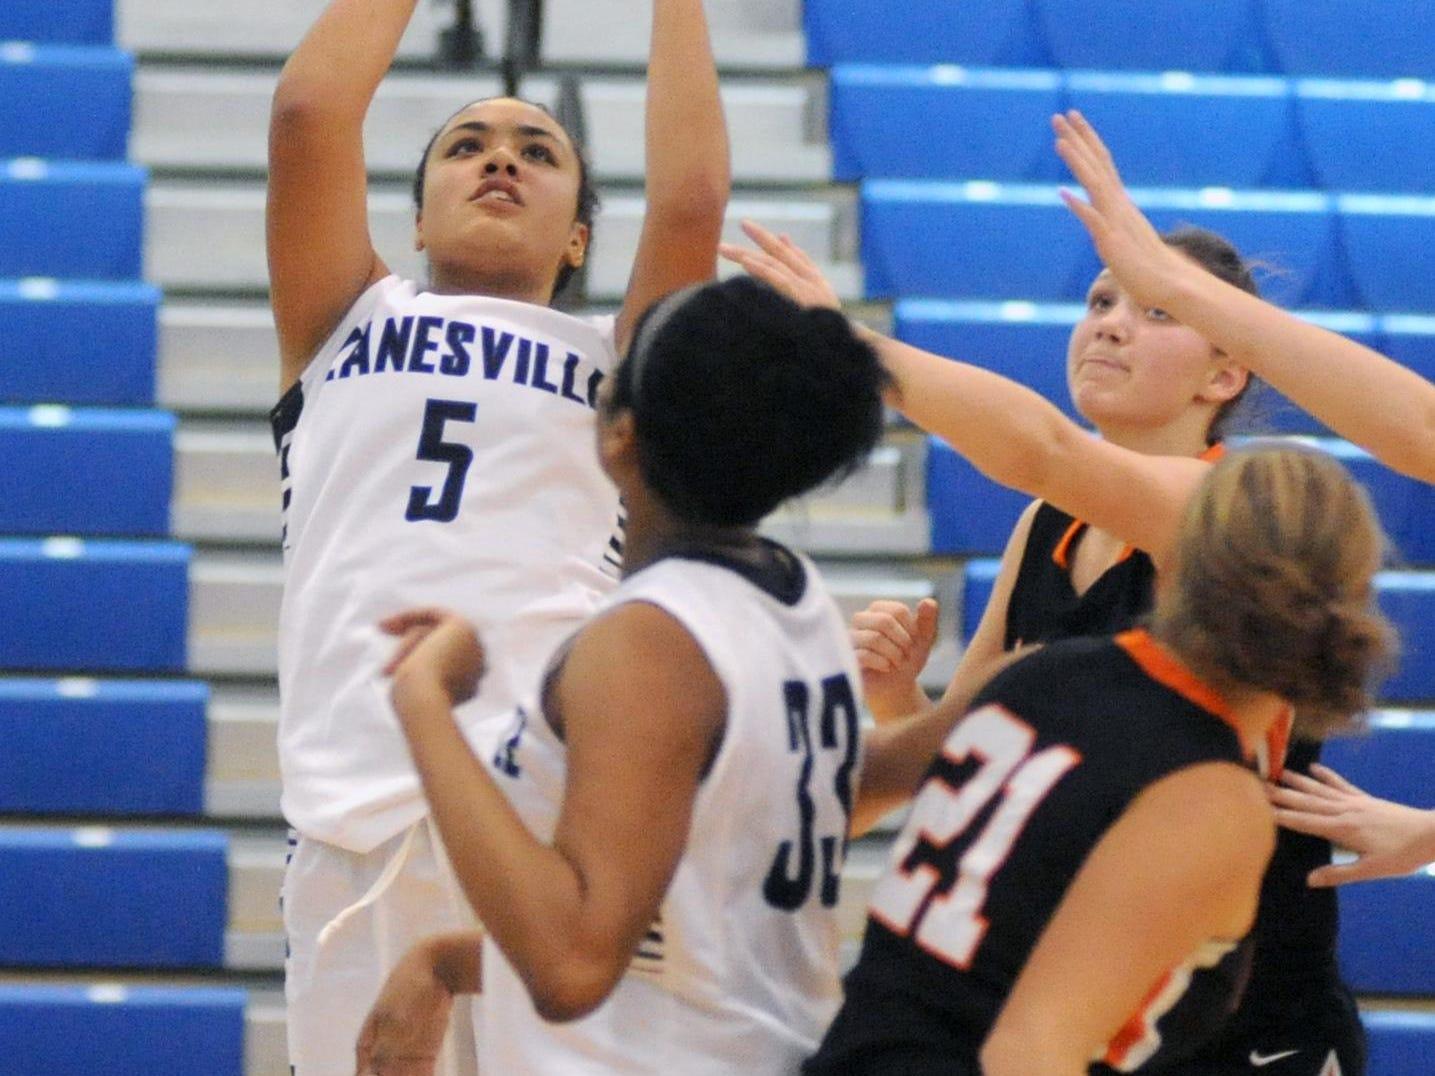 Zanesville's Lexi Draughn puts up a shot during a 46-30 win over Marietta on Saturday in Zanesville.